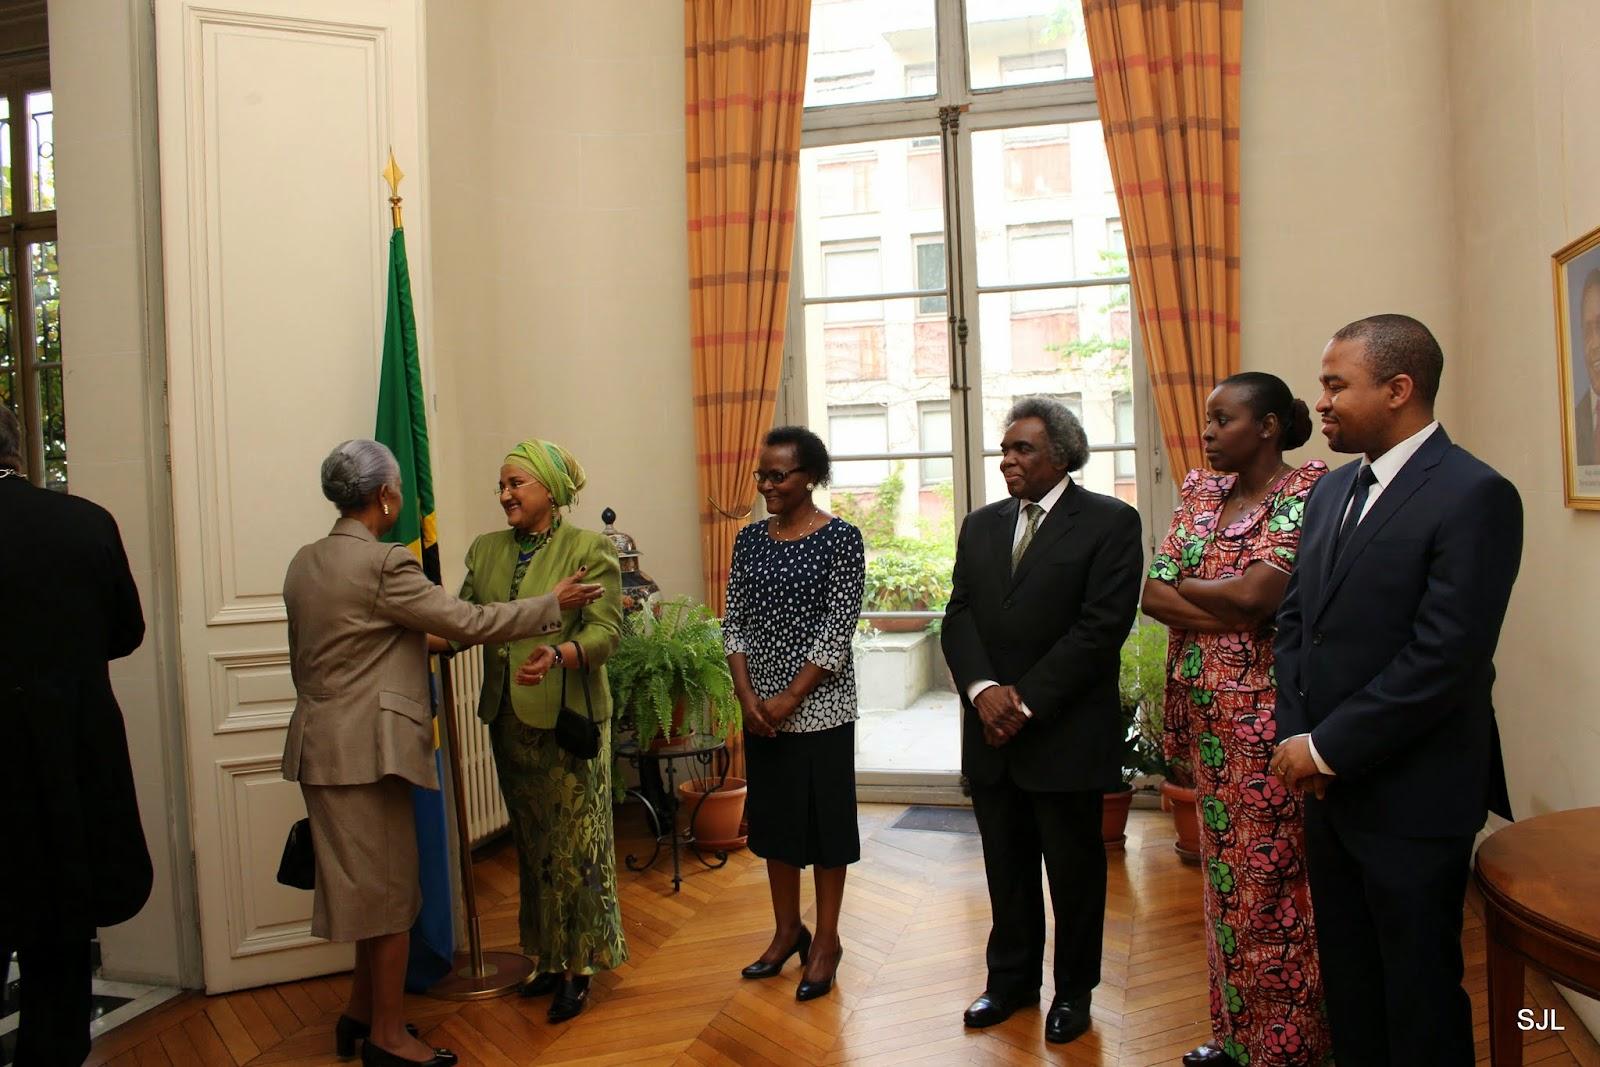 Barber Embassy : From Left: H.E Mrs Hilia Gomez Garez Lima Barber (Guinea Bissau ...